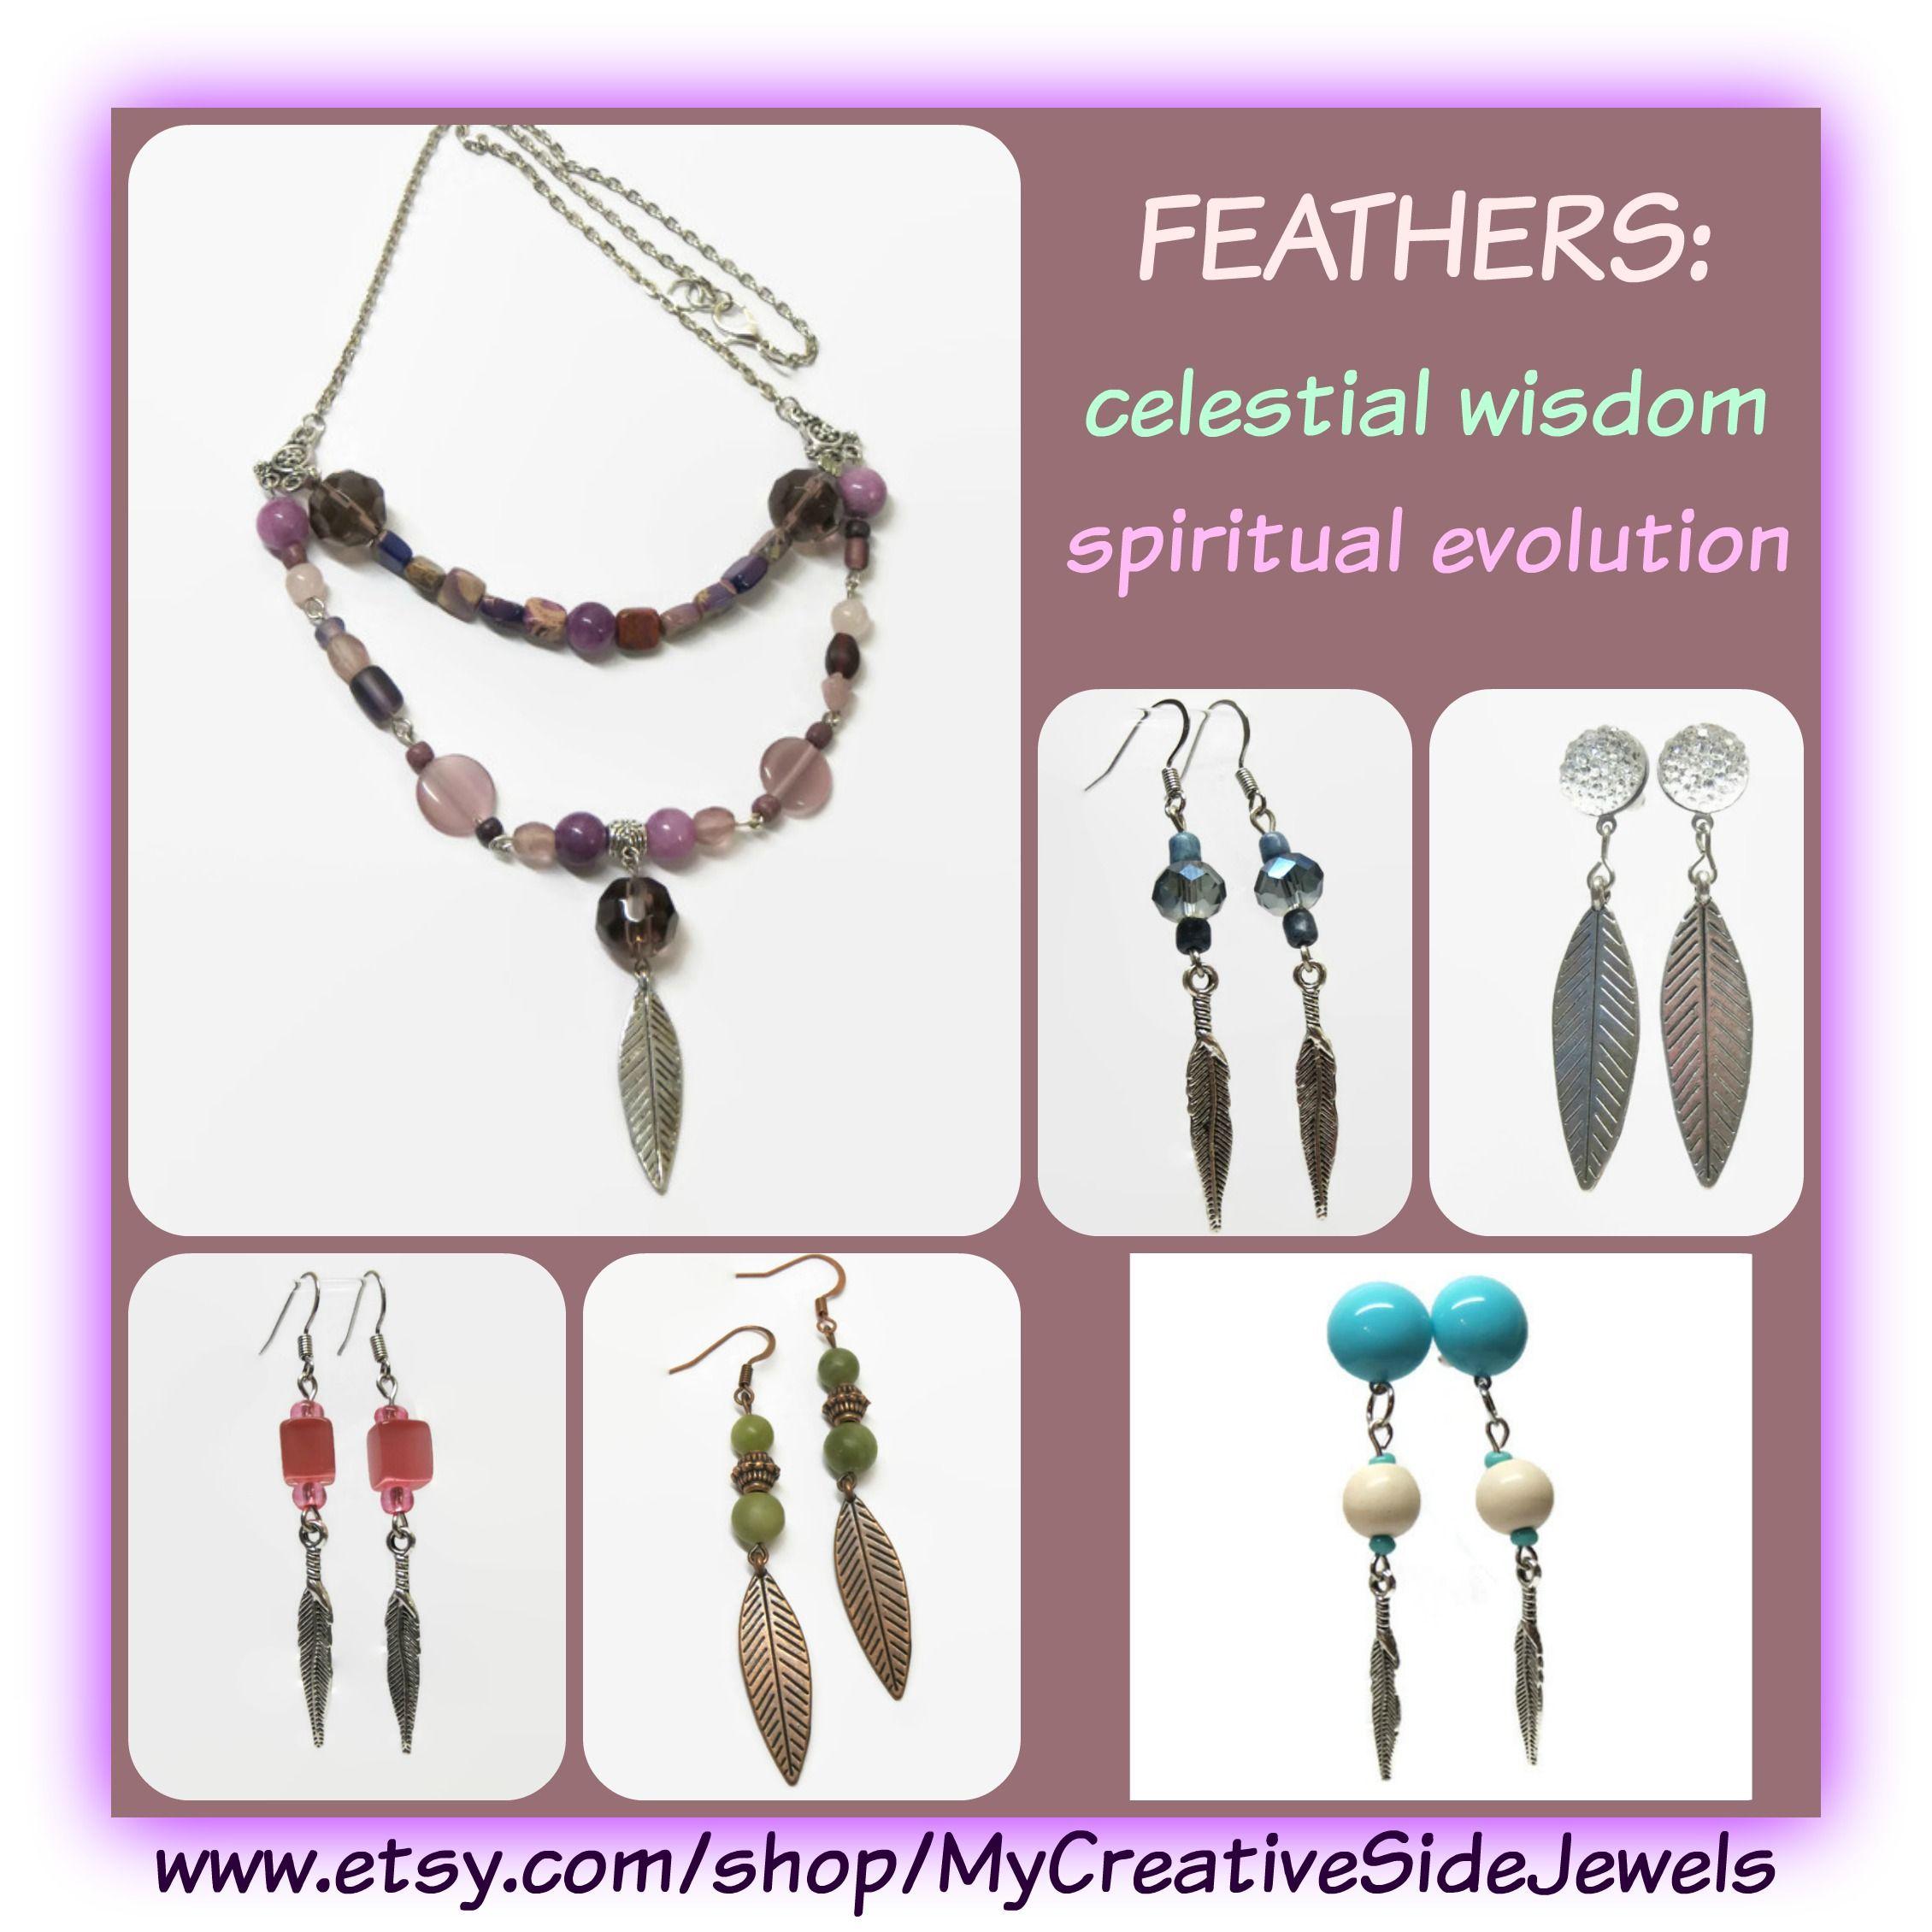 Feather jewelry.  Handmade. Celestial wisdom and spiritual evolution.  SHOP: https://www.etsy.com/shop/MyCreativeSideJewels